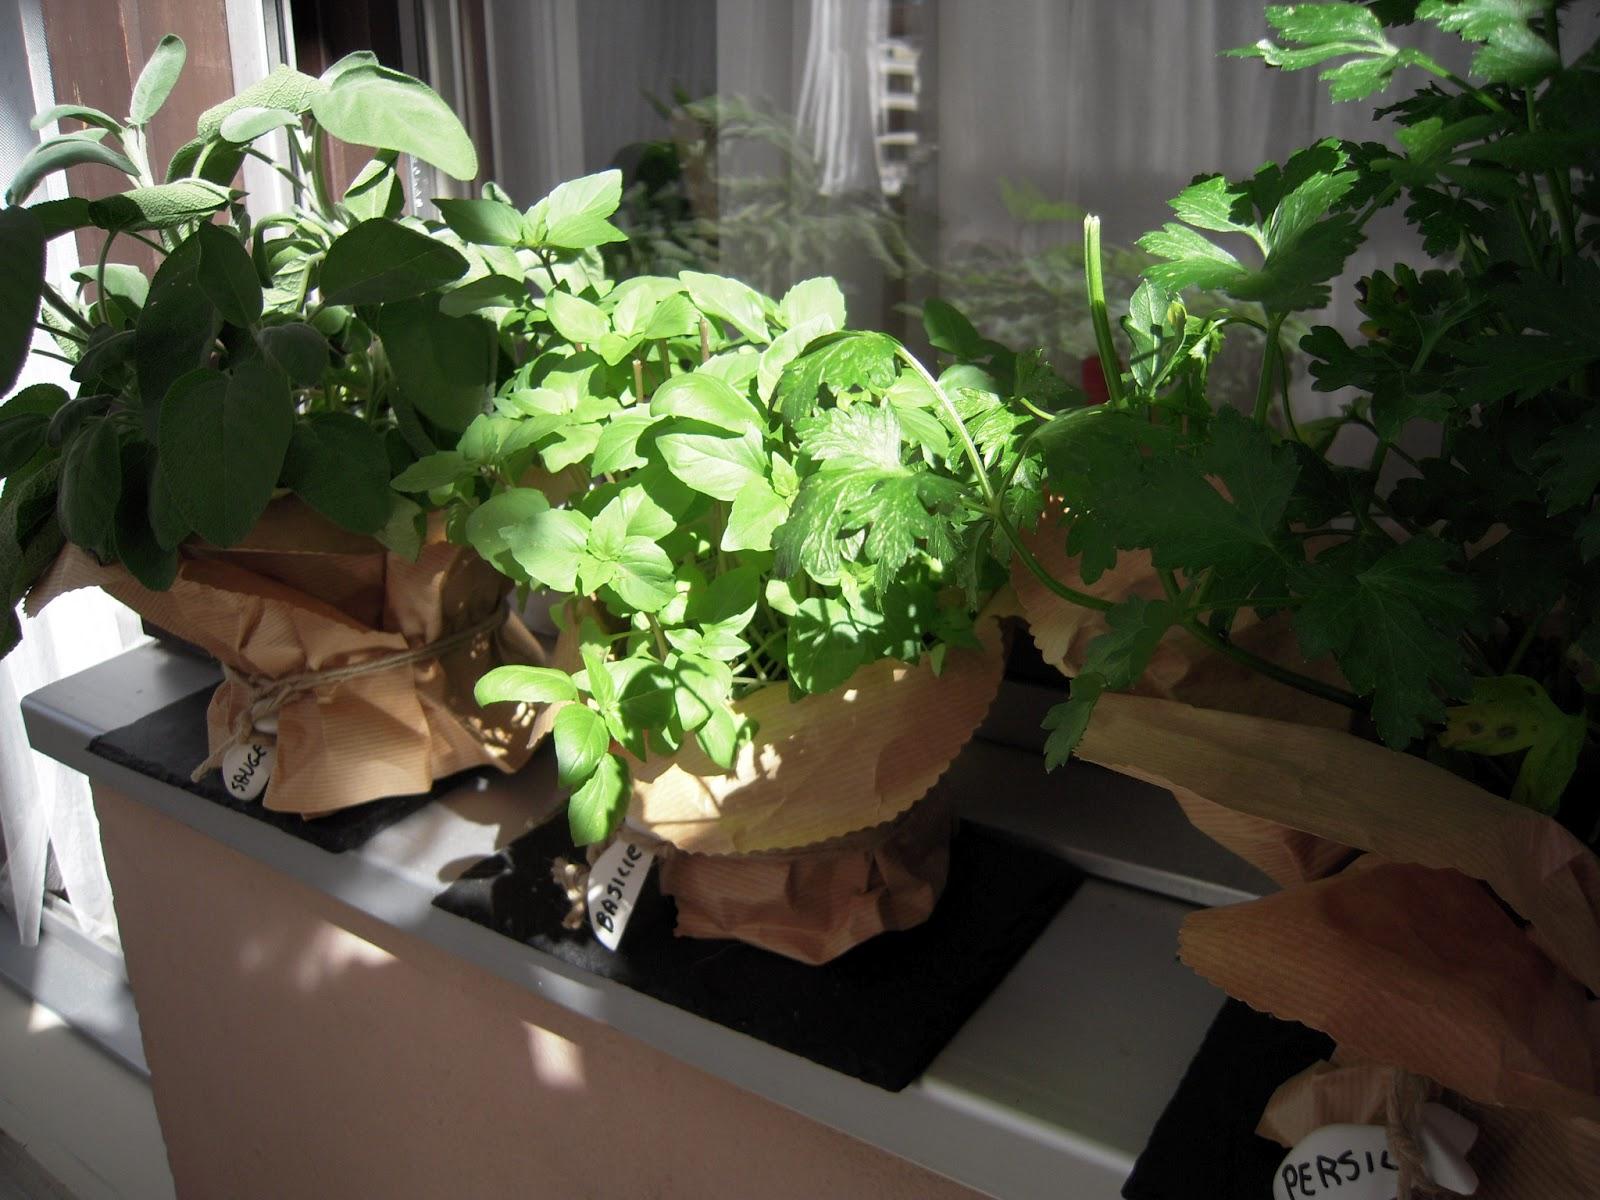 Piccole piante profumate basilico prezzemolo e salvia - Piante profumate ...